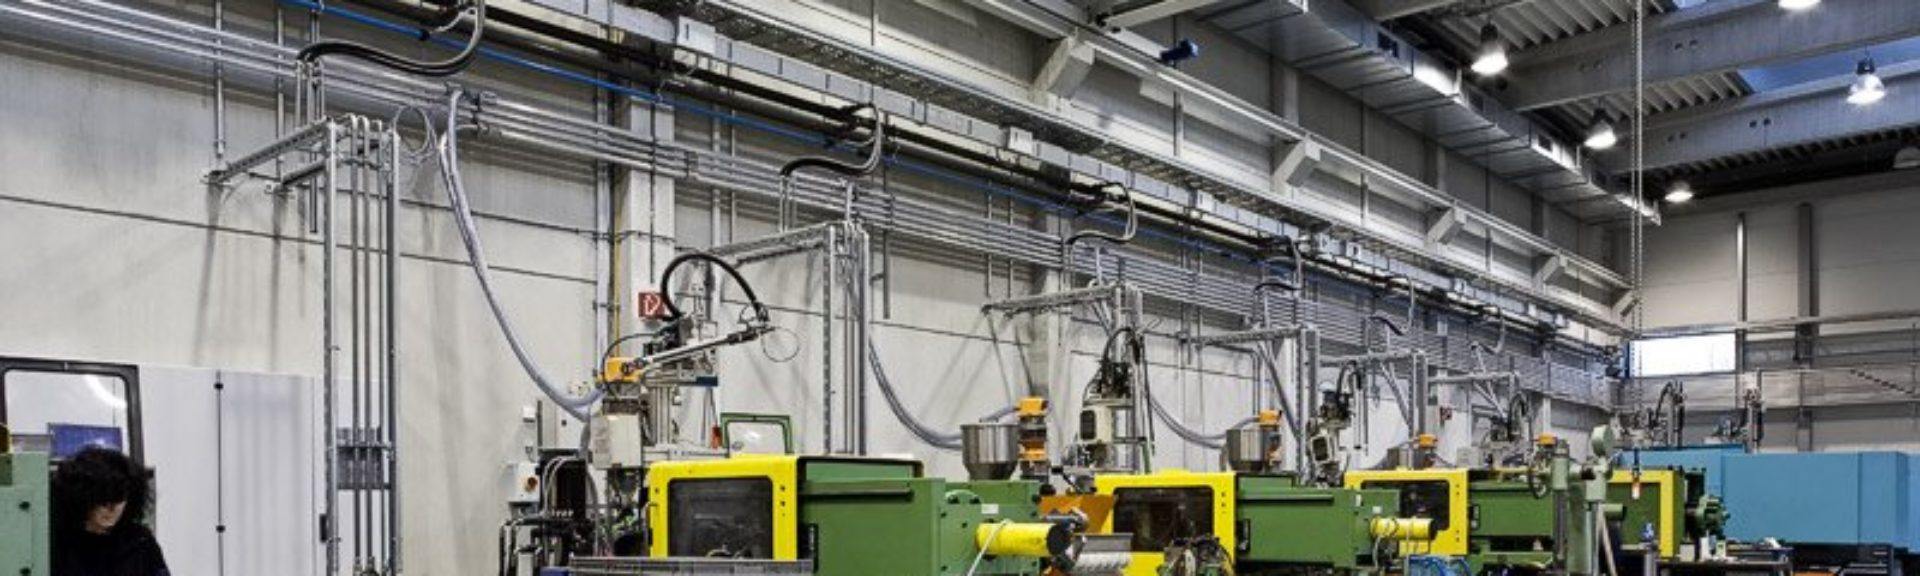 elobau Kunststoffspritzguss Maschinen